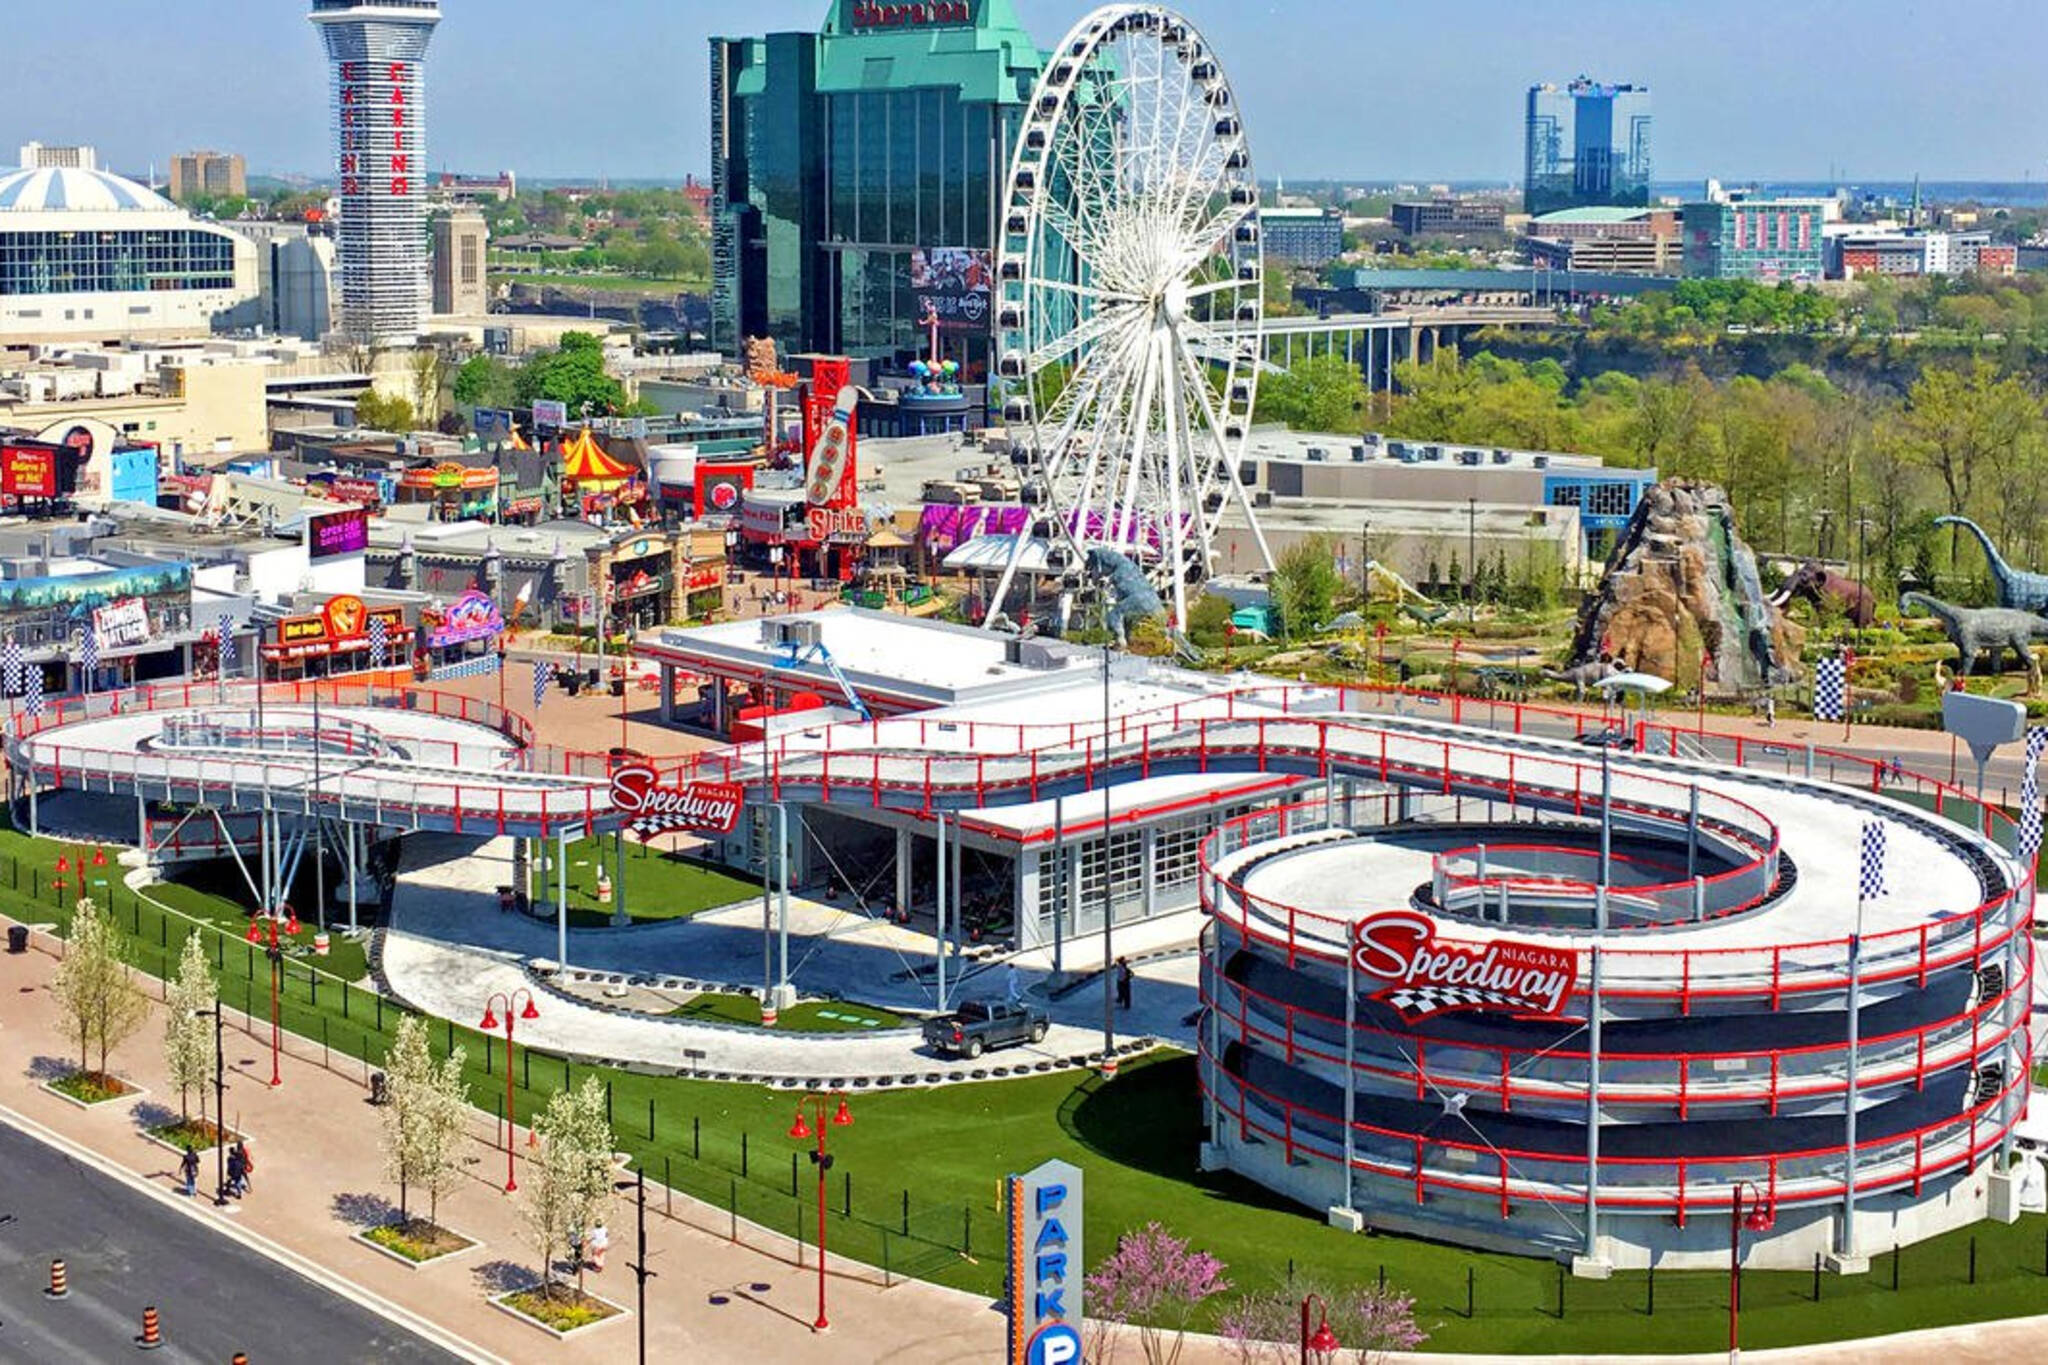 Niagara Falls Canada dating speed dating chile 2013